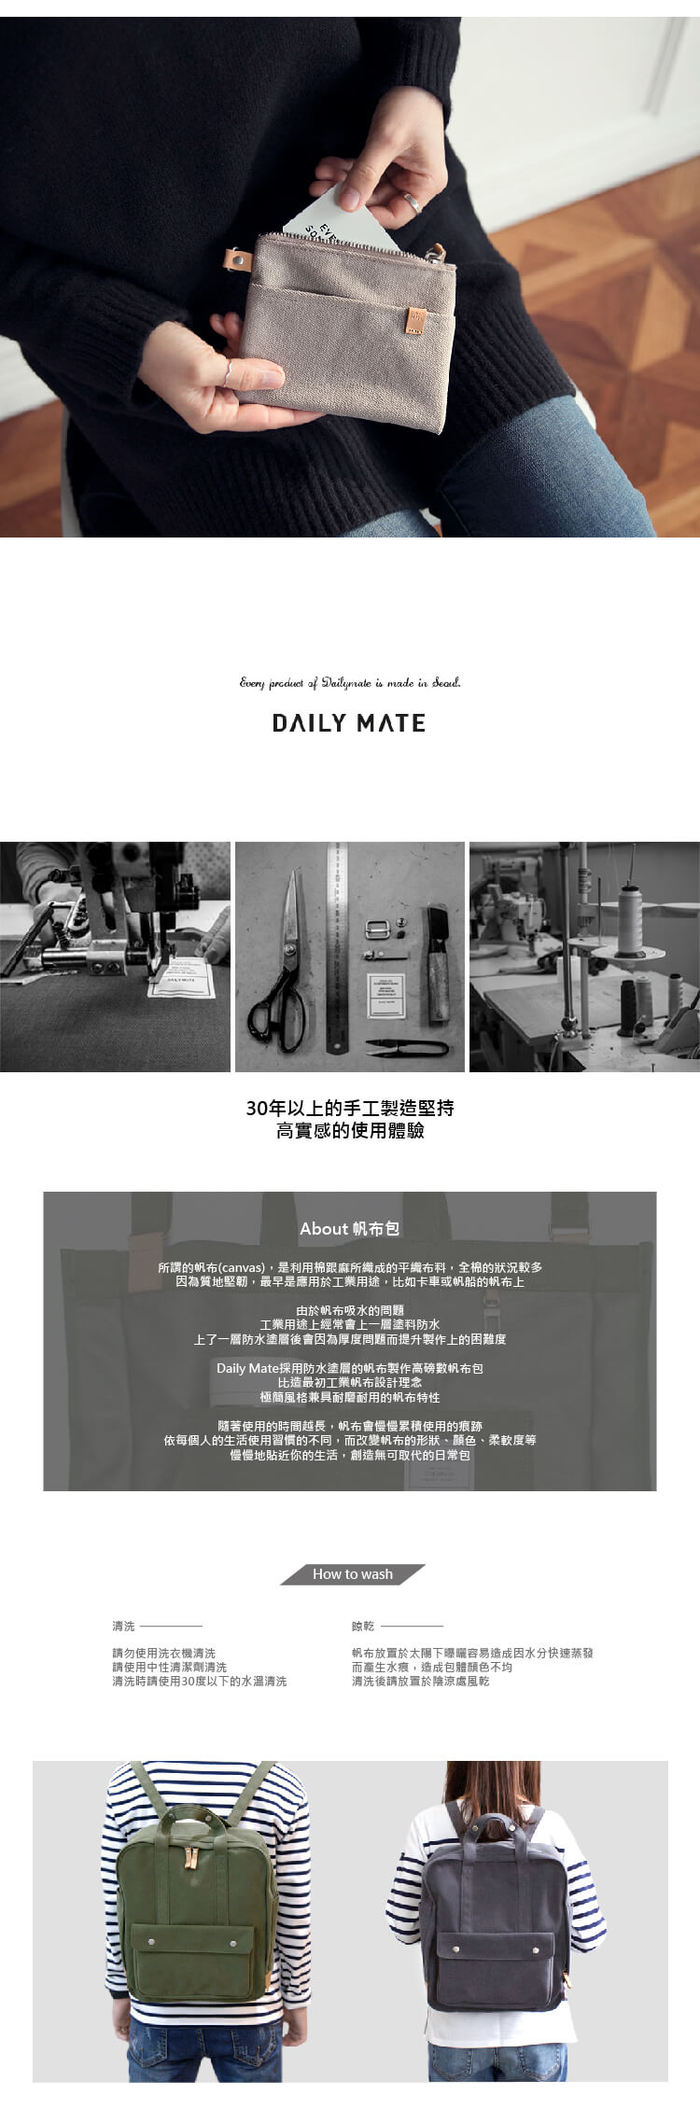 Daily mate|萬用收納袋S(酒紅)